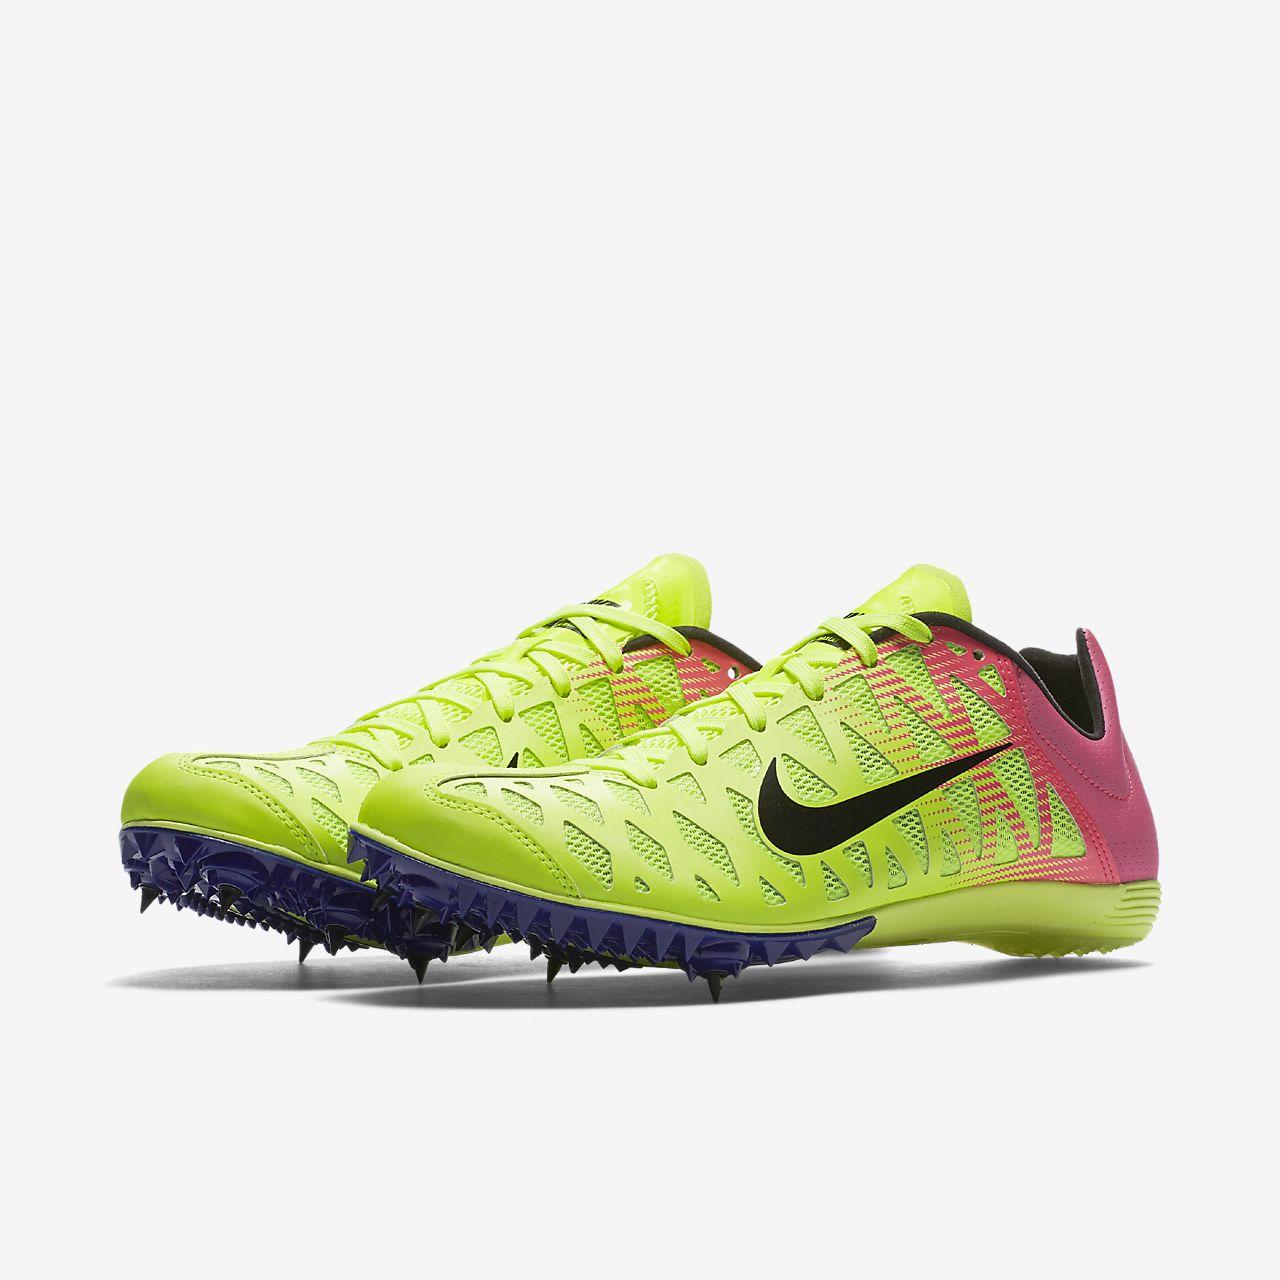 fa452be592be Nike Wmns Lunarstelos OC Multi color 844740 999